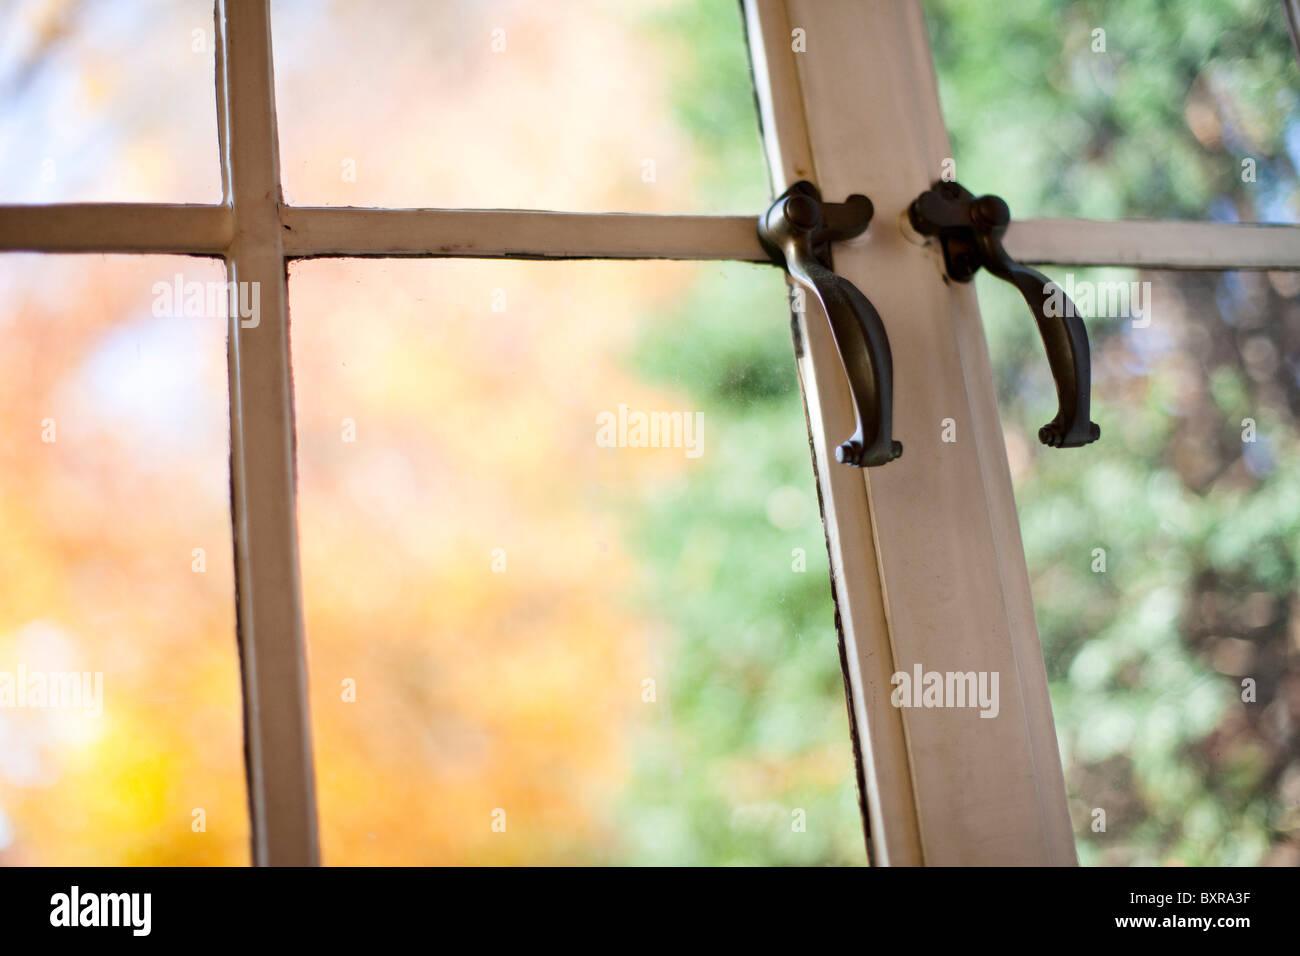 ventana antigua Imagen De Stock